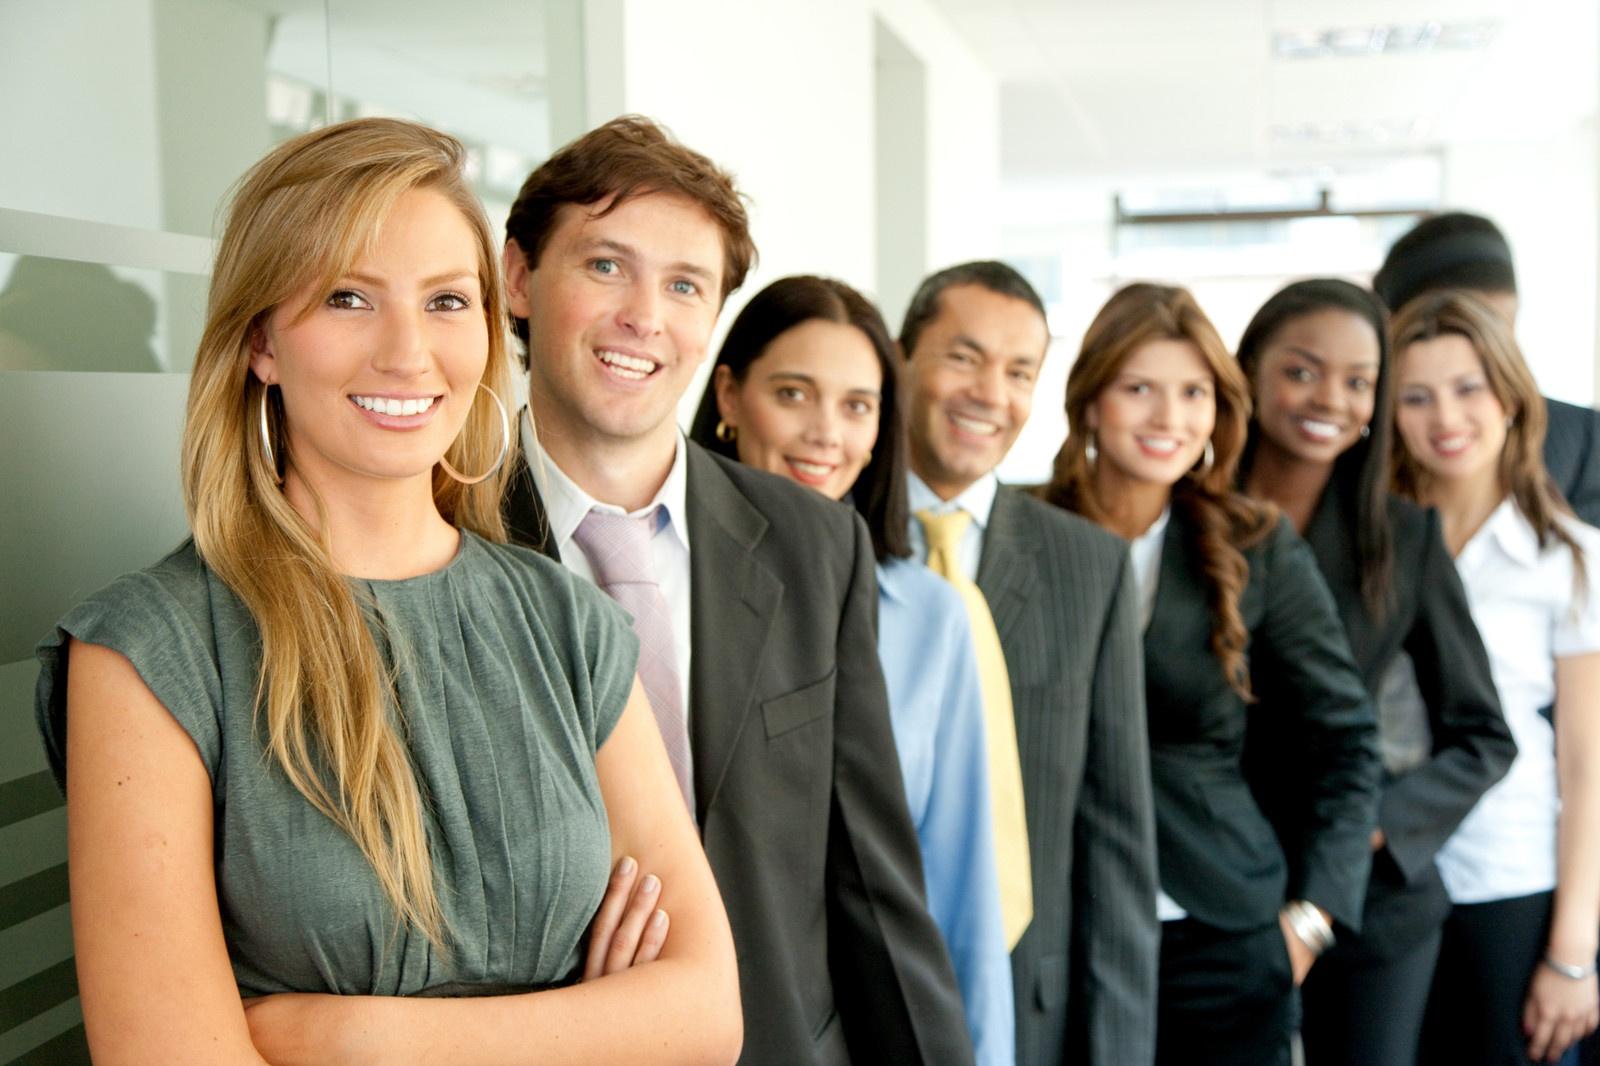 Corporate_employees_-_stock.jpg